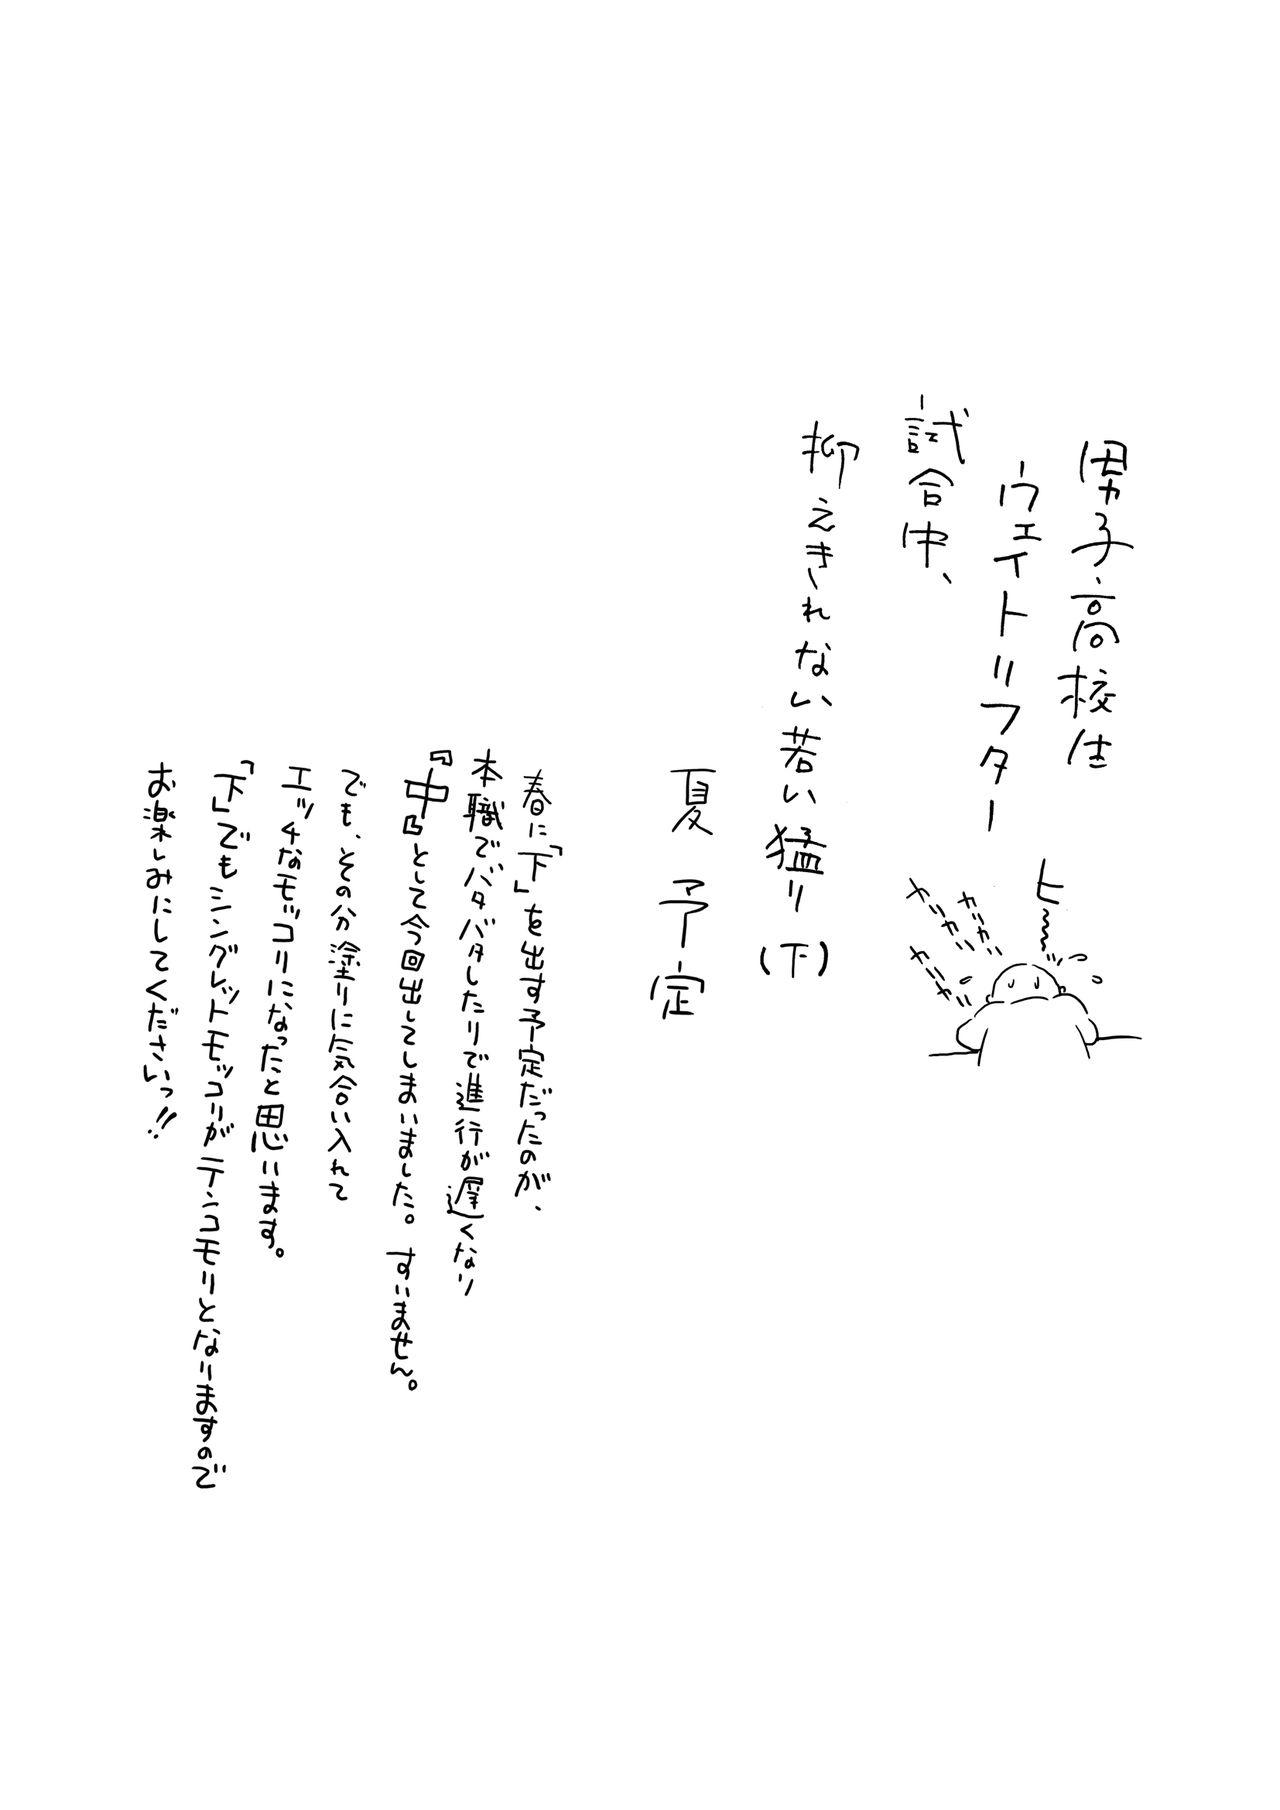 Danshi Koukousei Weightlifter Shiai-chuu, Osae kirenai Wakai Takeri 56